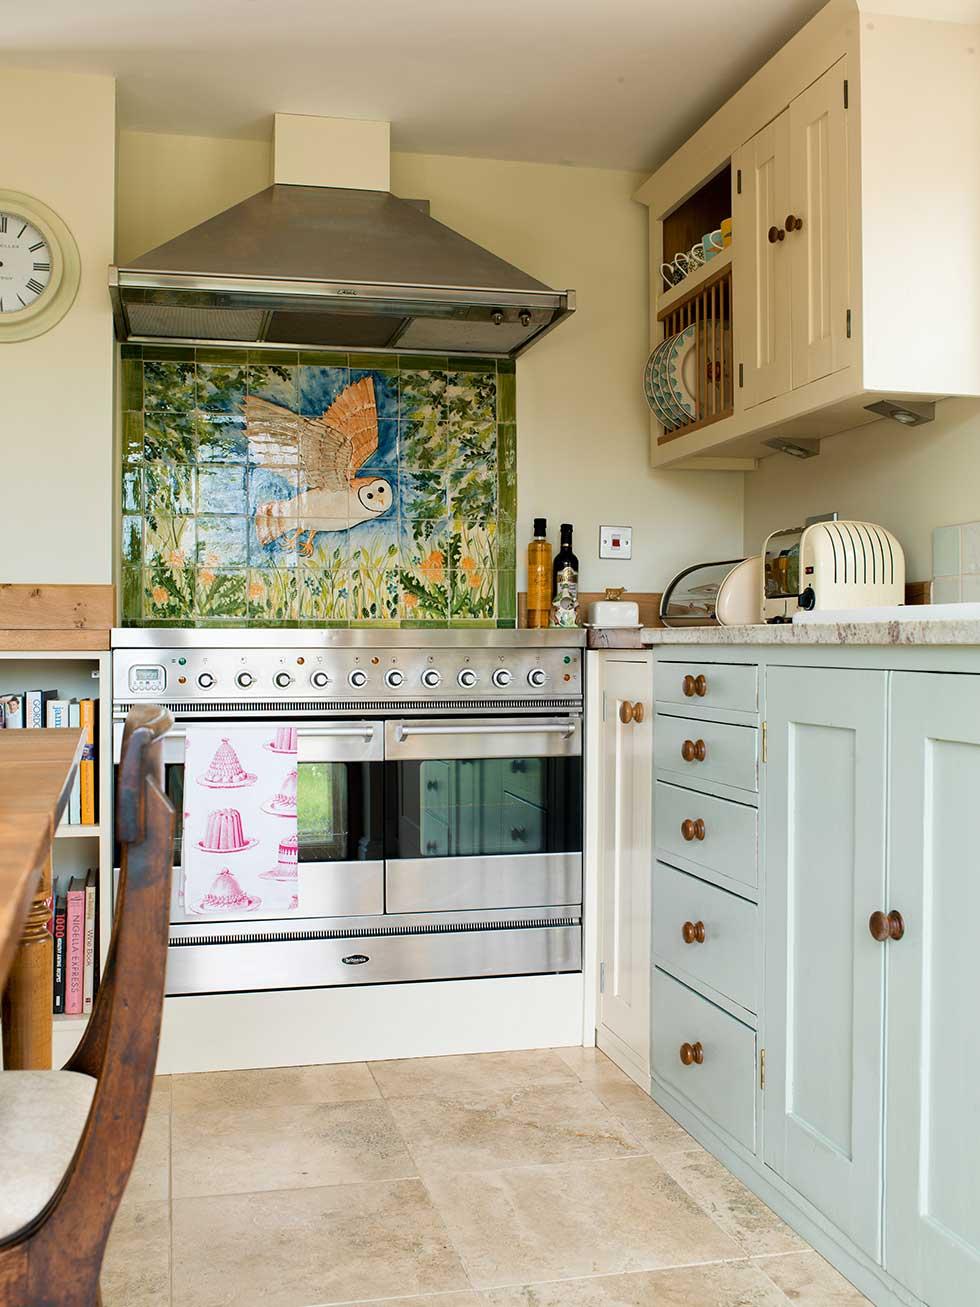 rush-kitchen-cooker-extractor